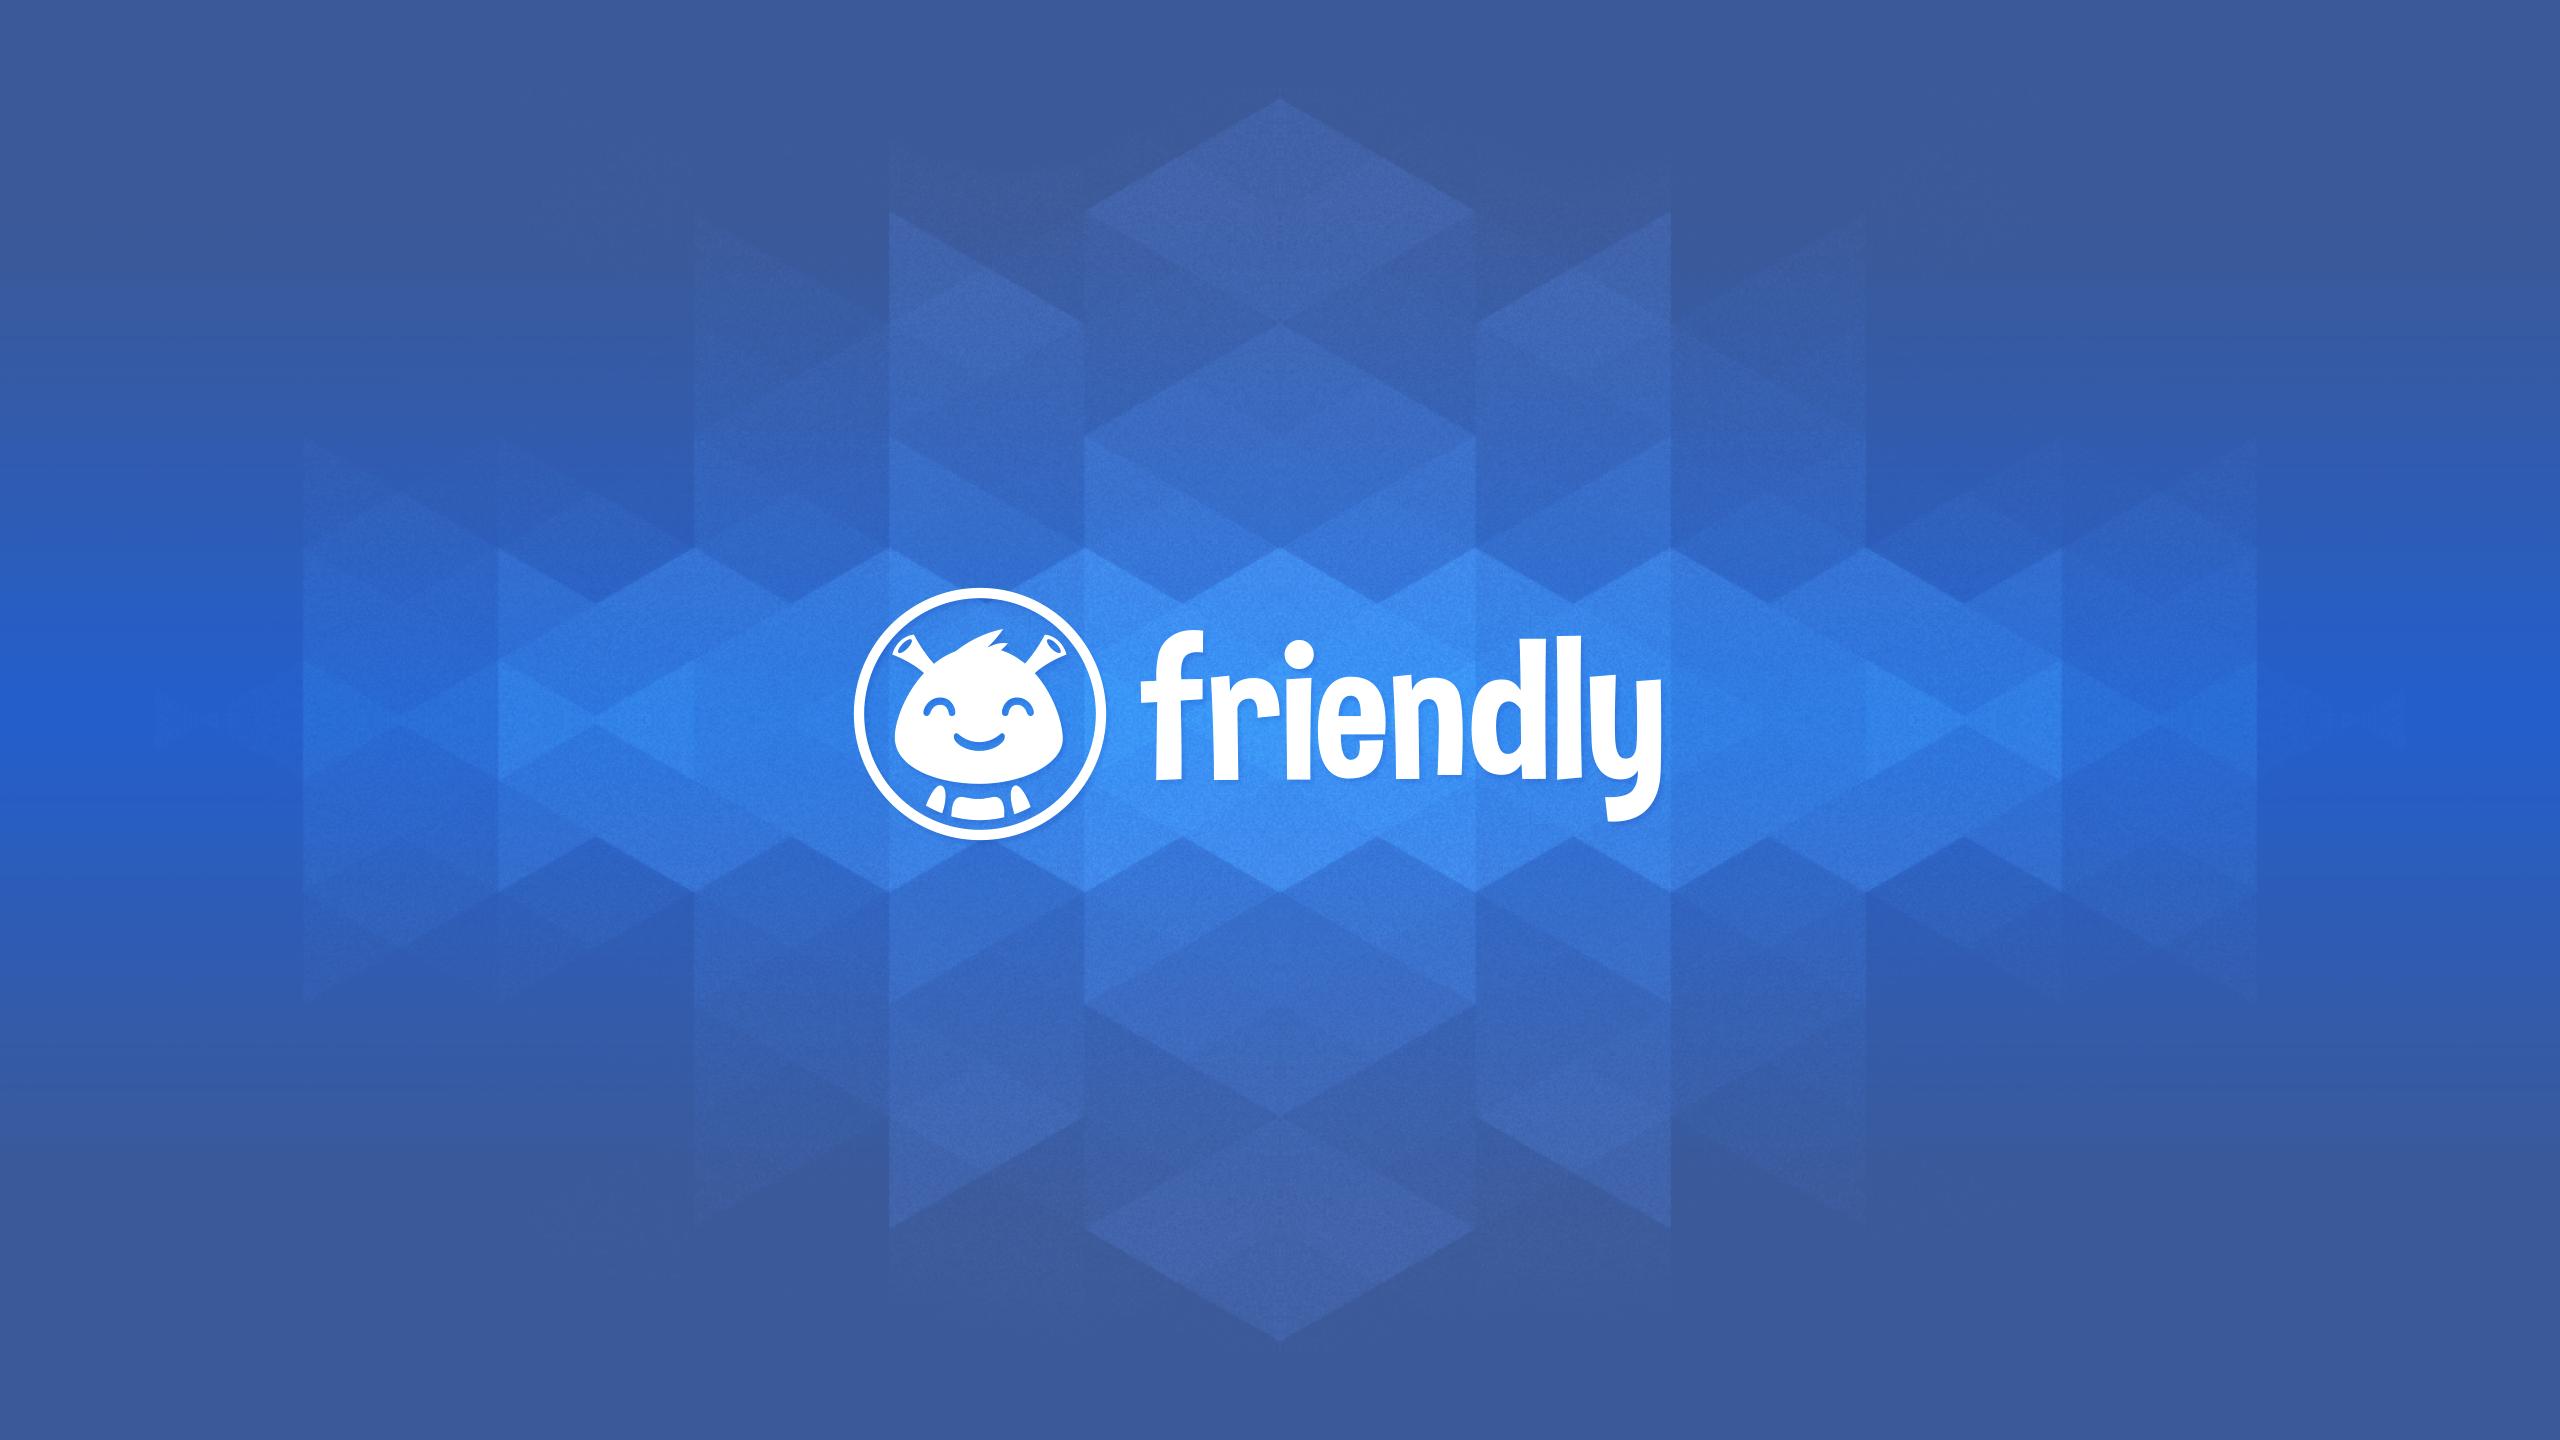 phriendly app